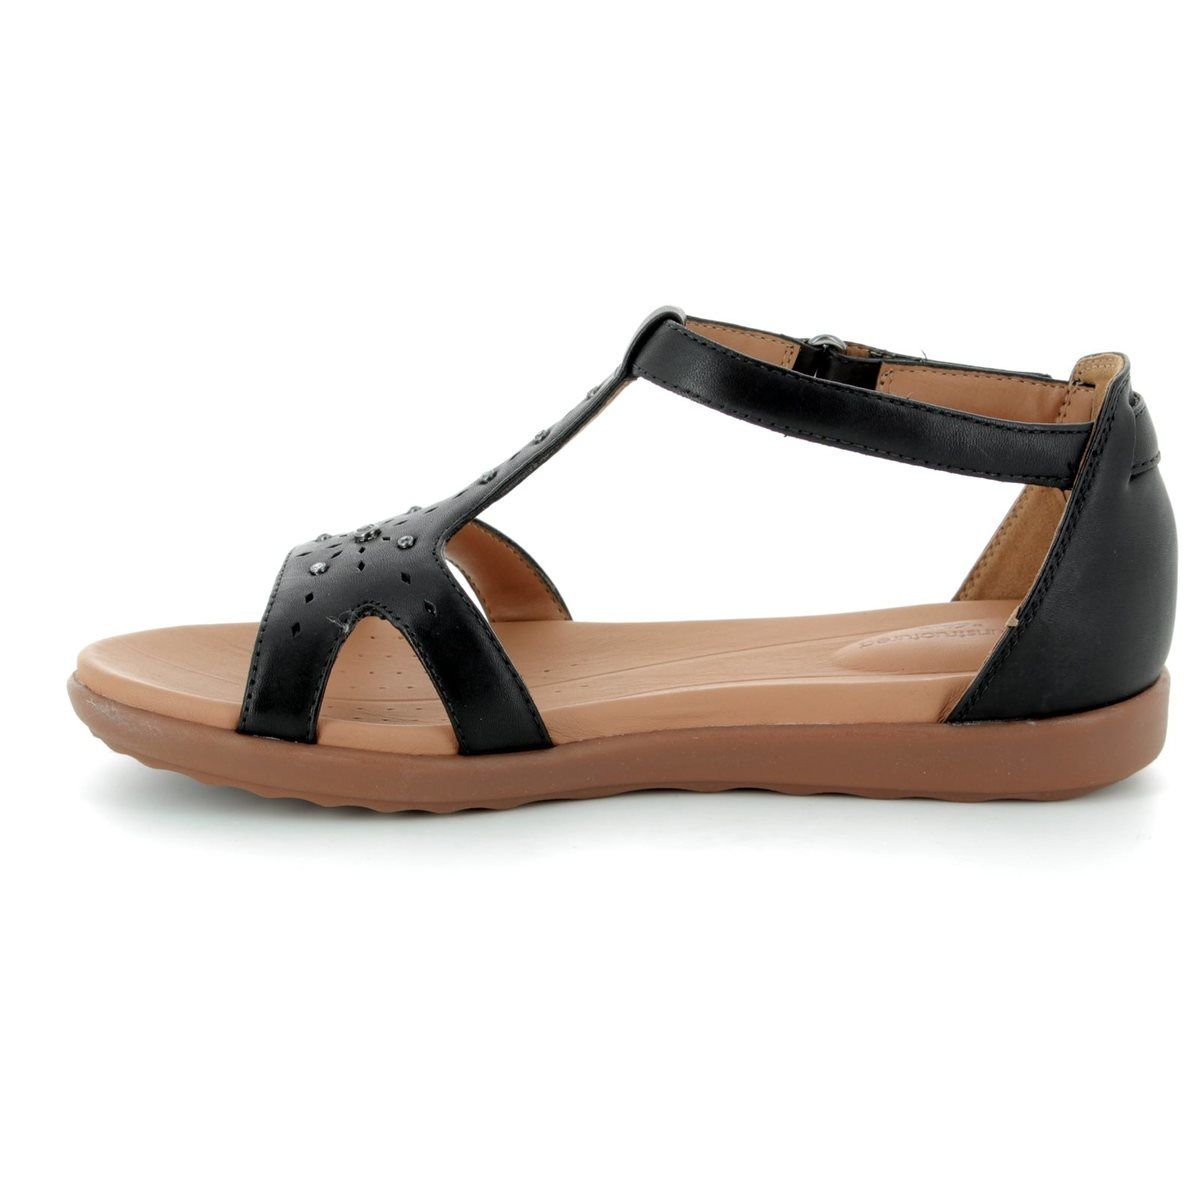 8b5904898889 Clarks Sandals - Black - 3325 84D UN REISEL MARA